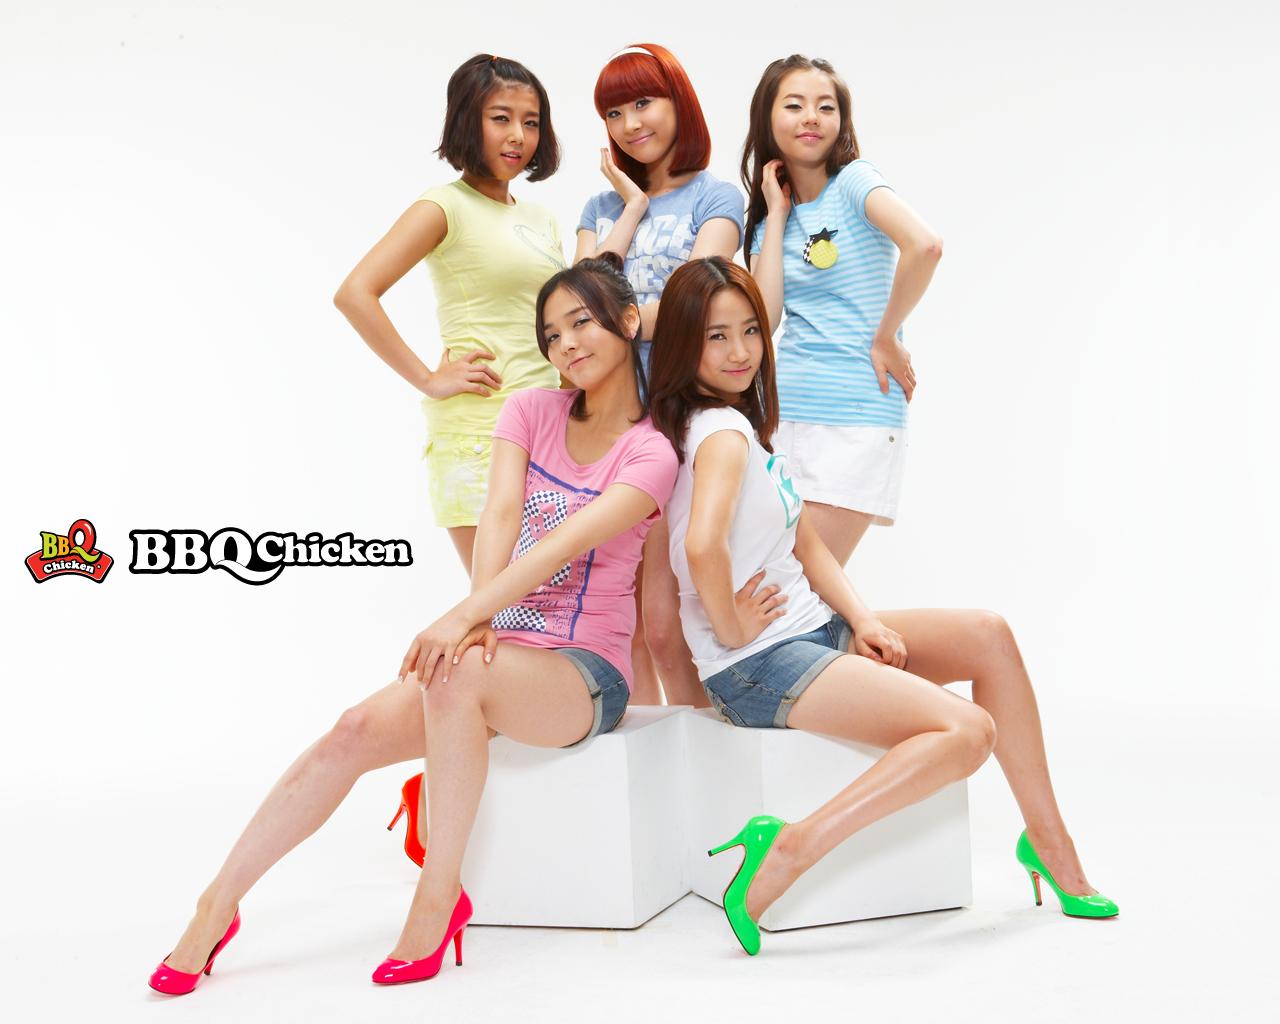 http://1.bp.blogspot.com/-Q-EnrkwQMrw/TldXON9-9LI/AAAAAAAAA30/idf_RGG_afM/s1600/Wonder+Girls+Wallpaper+2.jpg